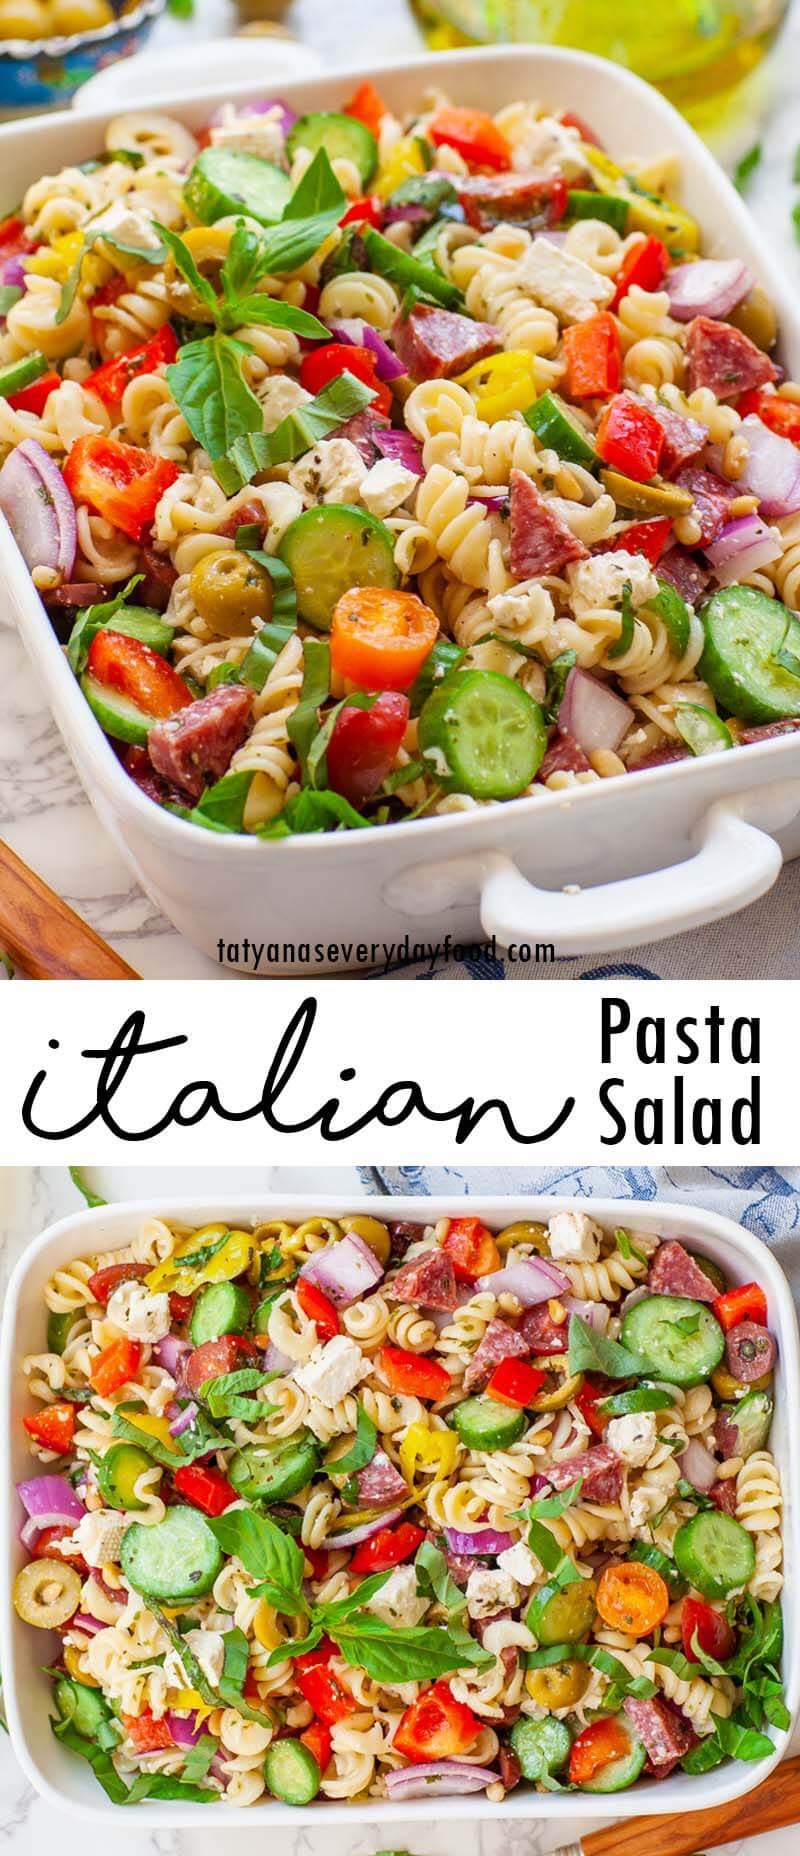 The Best Italian Pasta Salad video recipe